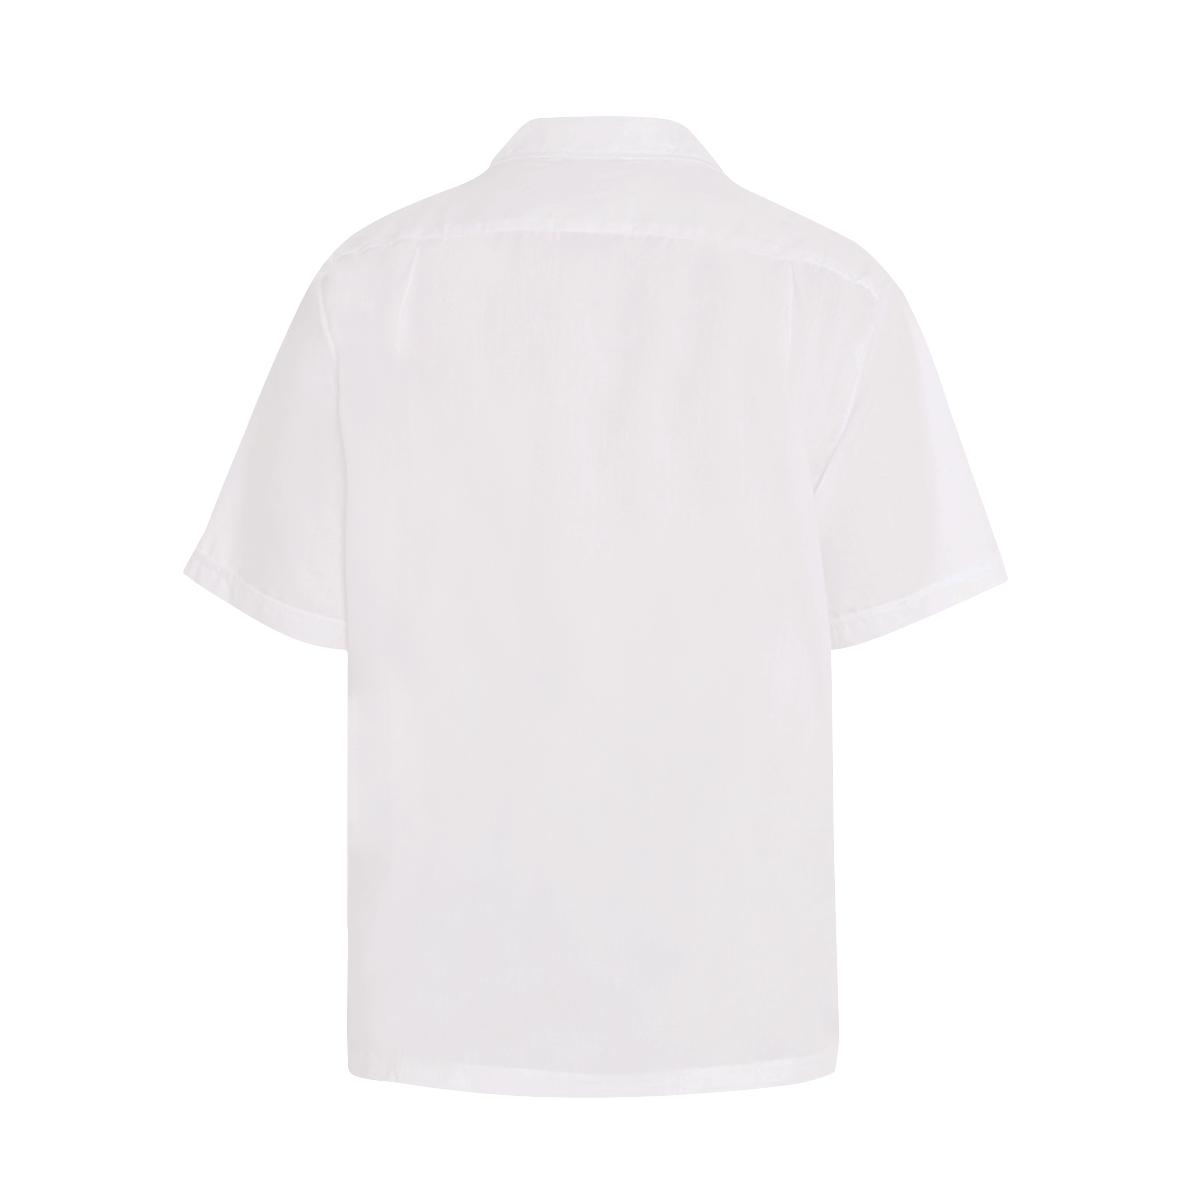 Hawaiian Shirt with Chest Pocket (Model T58)